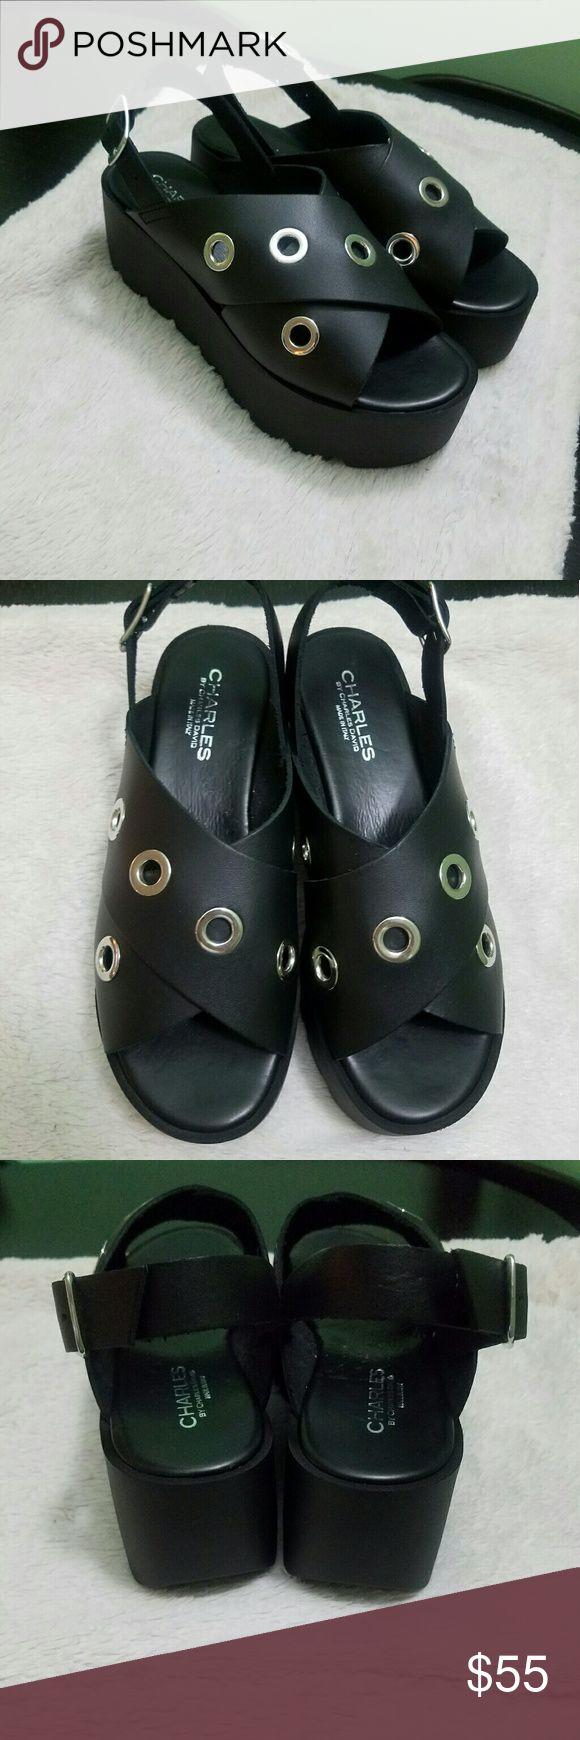 Charles david platform sandals Nwob. Charles by Charles David sandals. Charles David Shoes Sandals